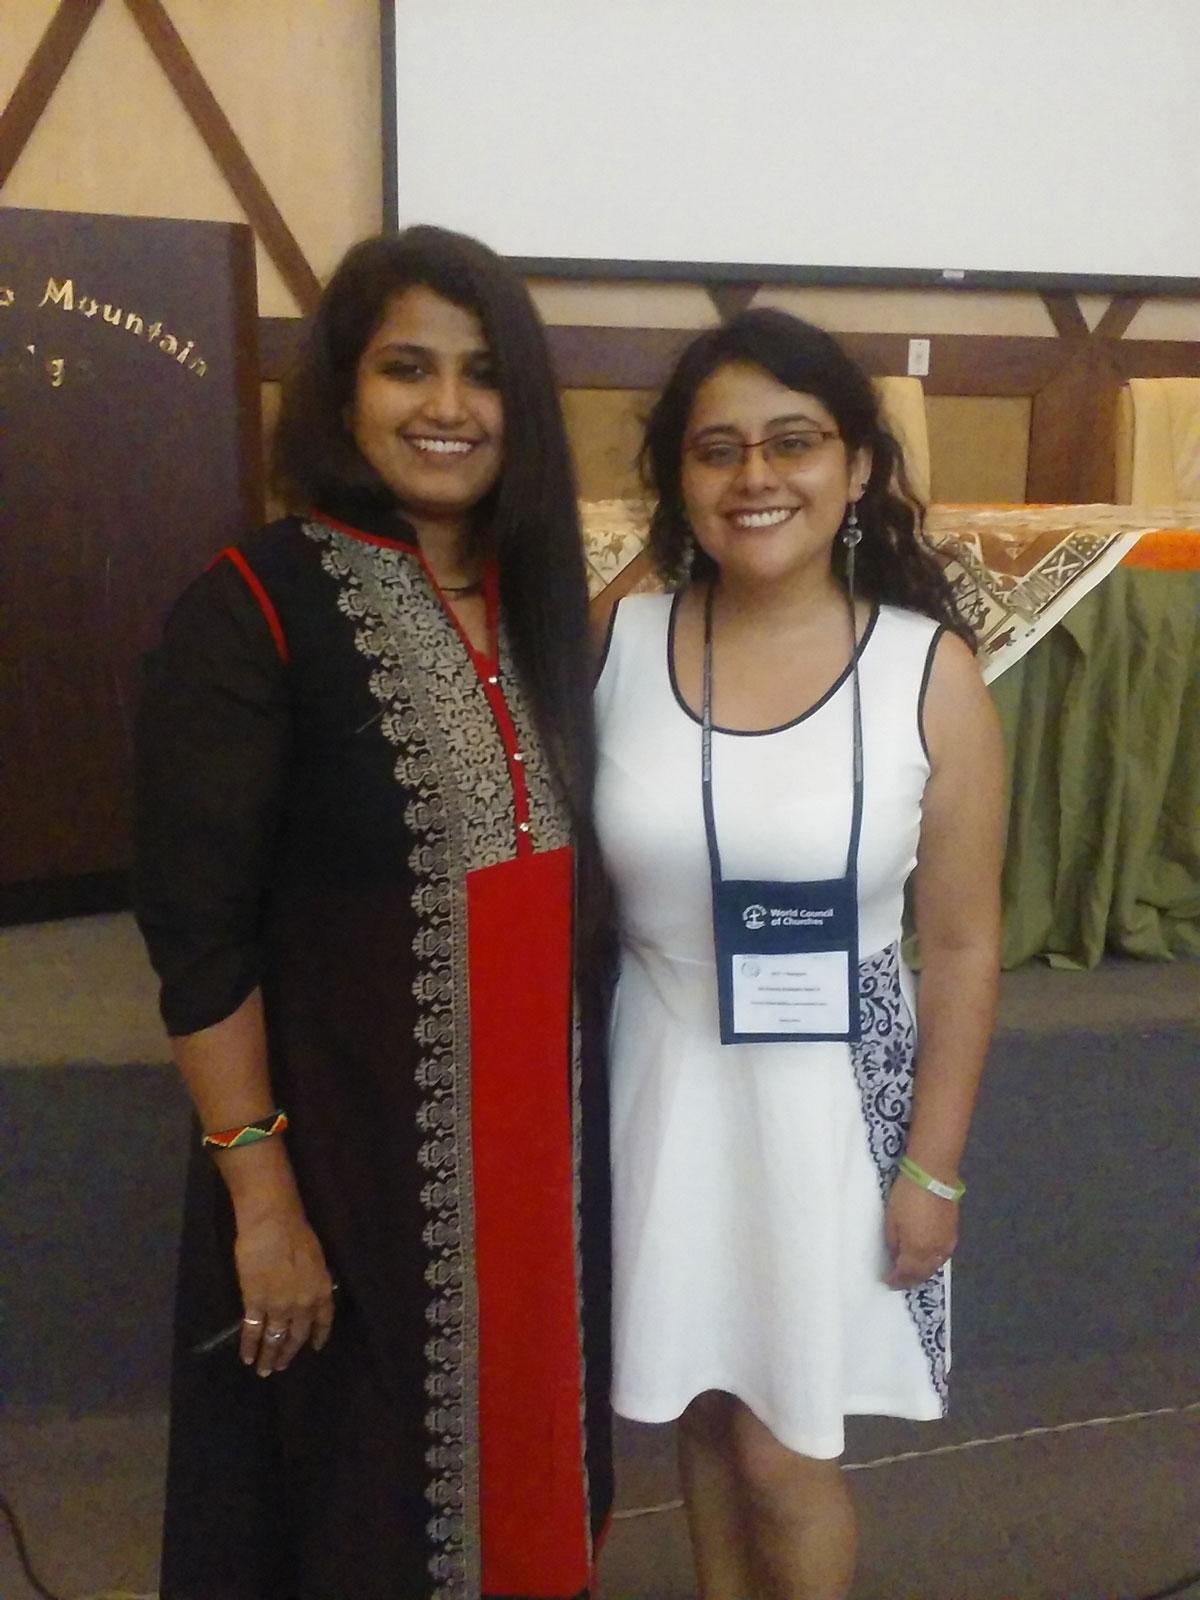 Nataly with Vedanayagam Vethakani from India.